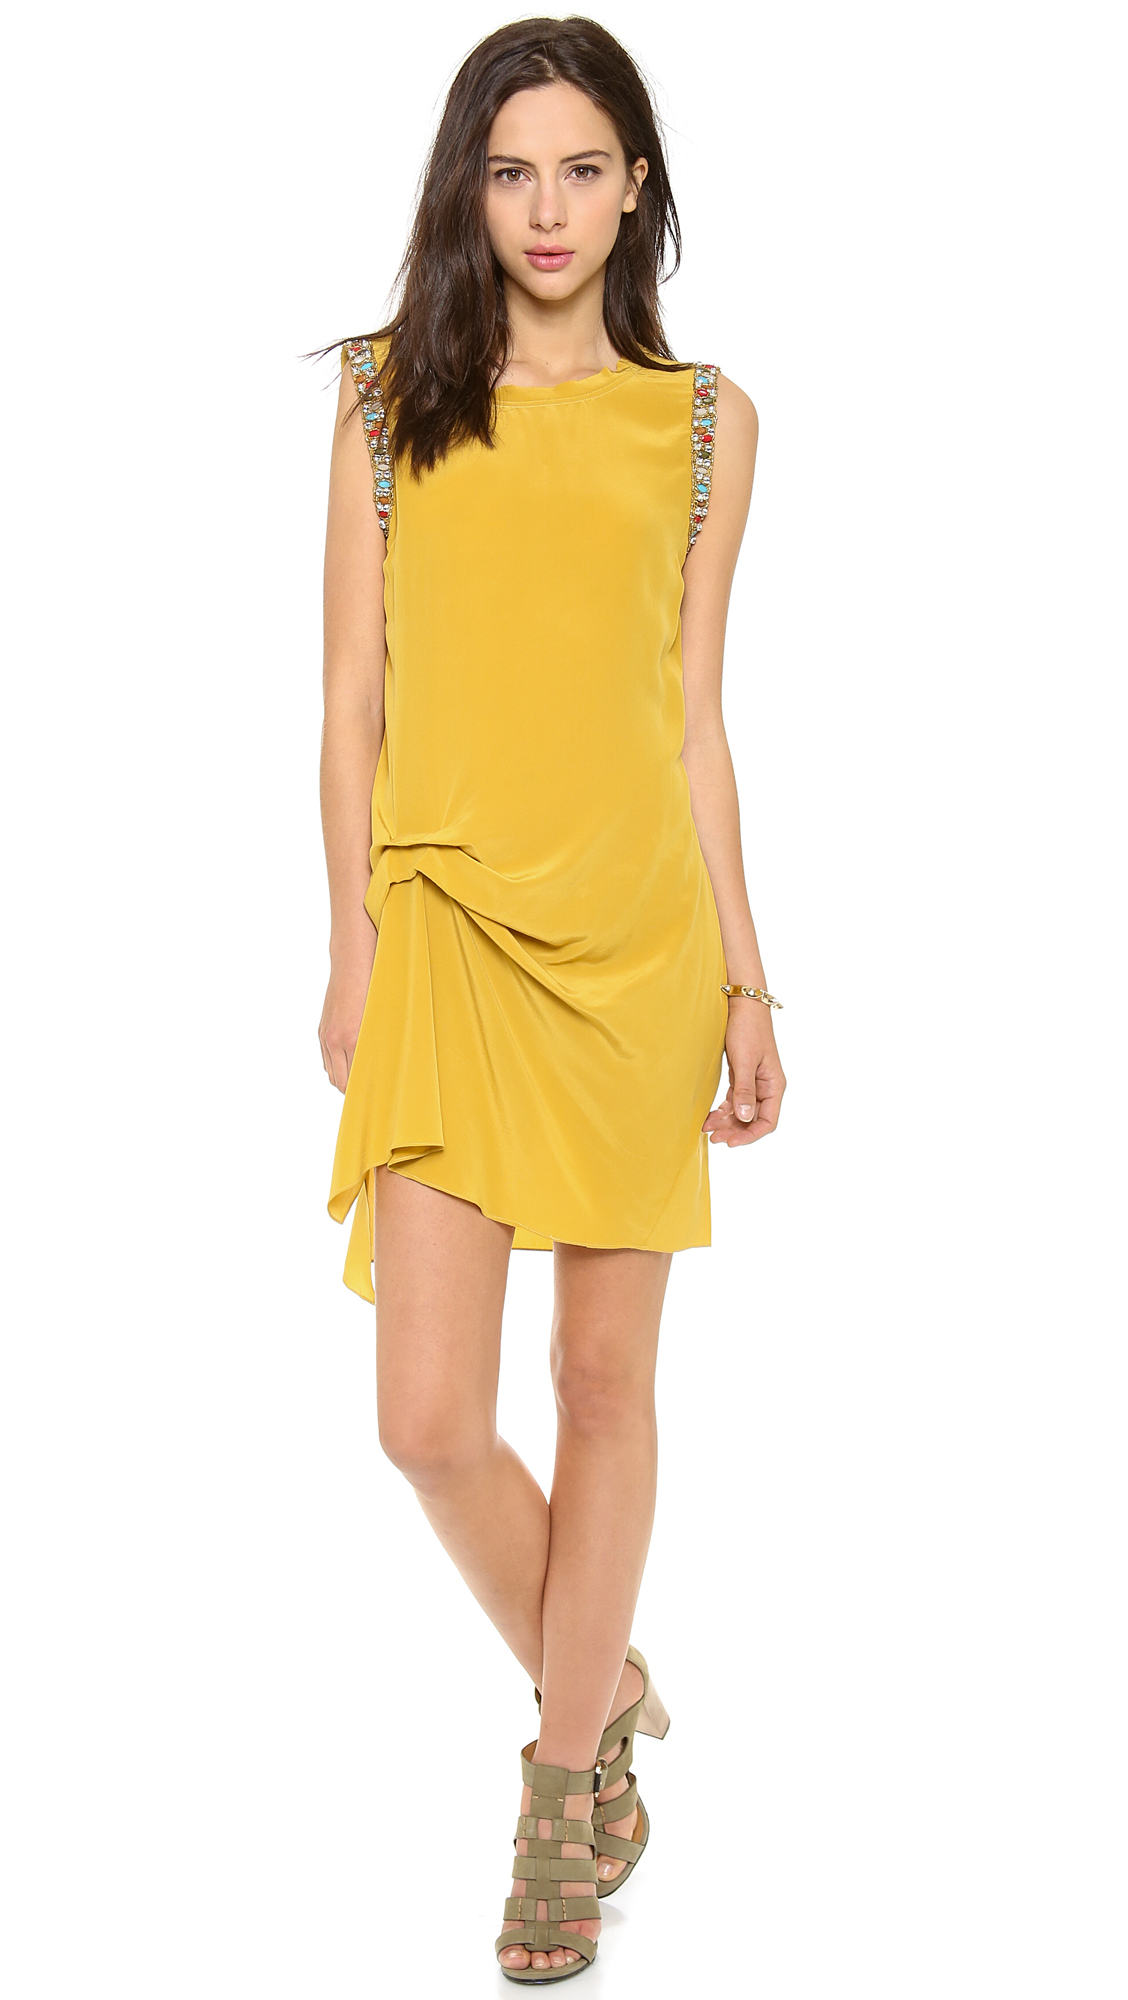 haute-hippie-goldenrod-side-gather-dress